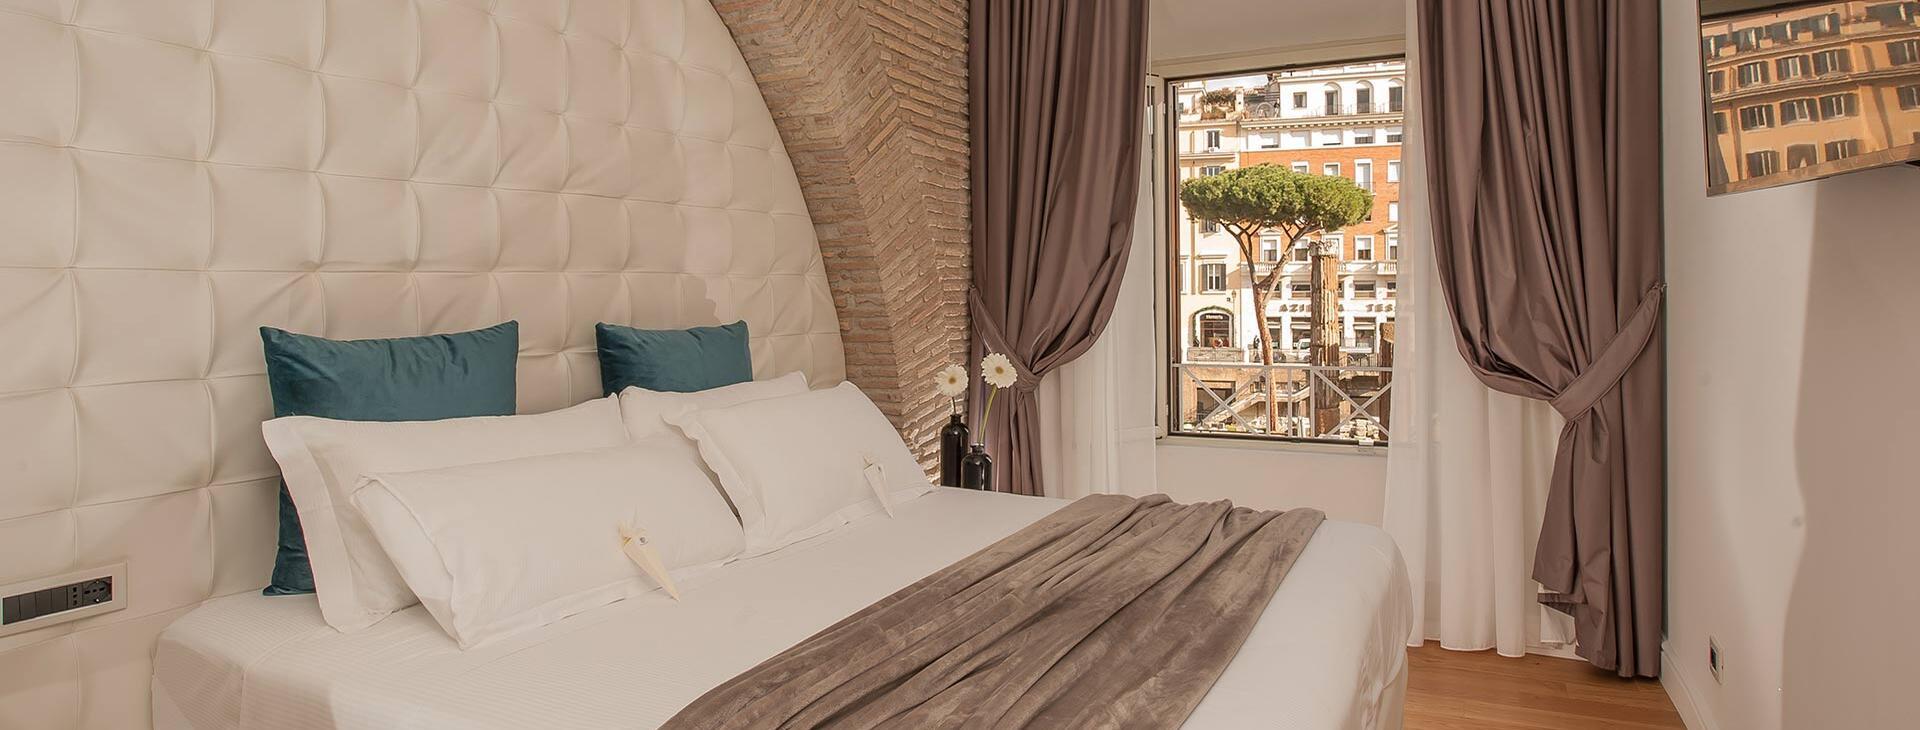 argentinastylehotel it studio-suite 001